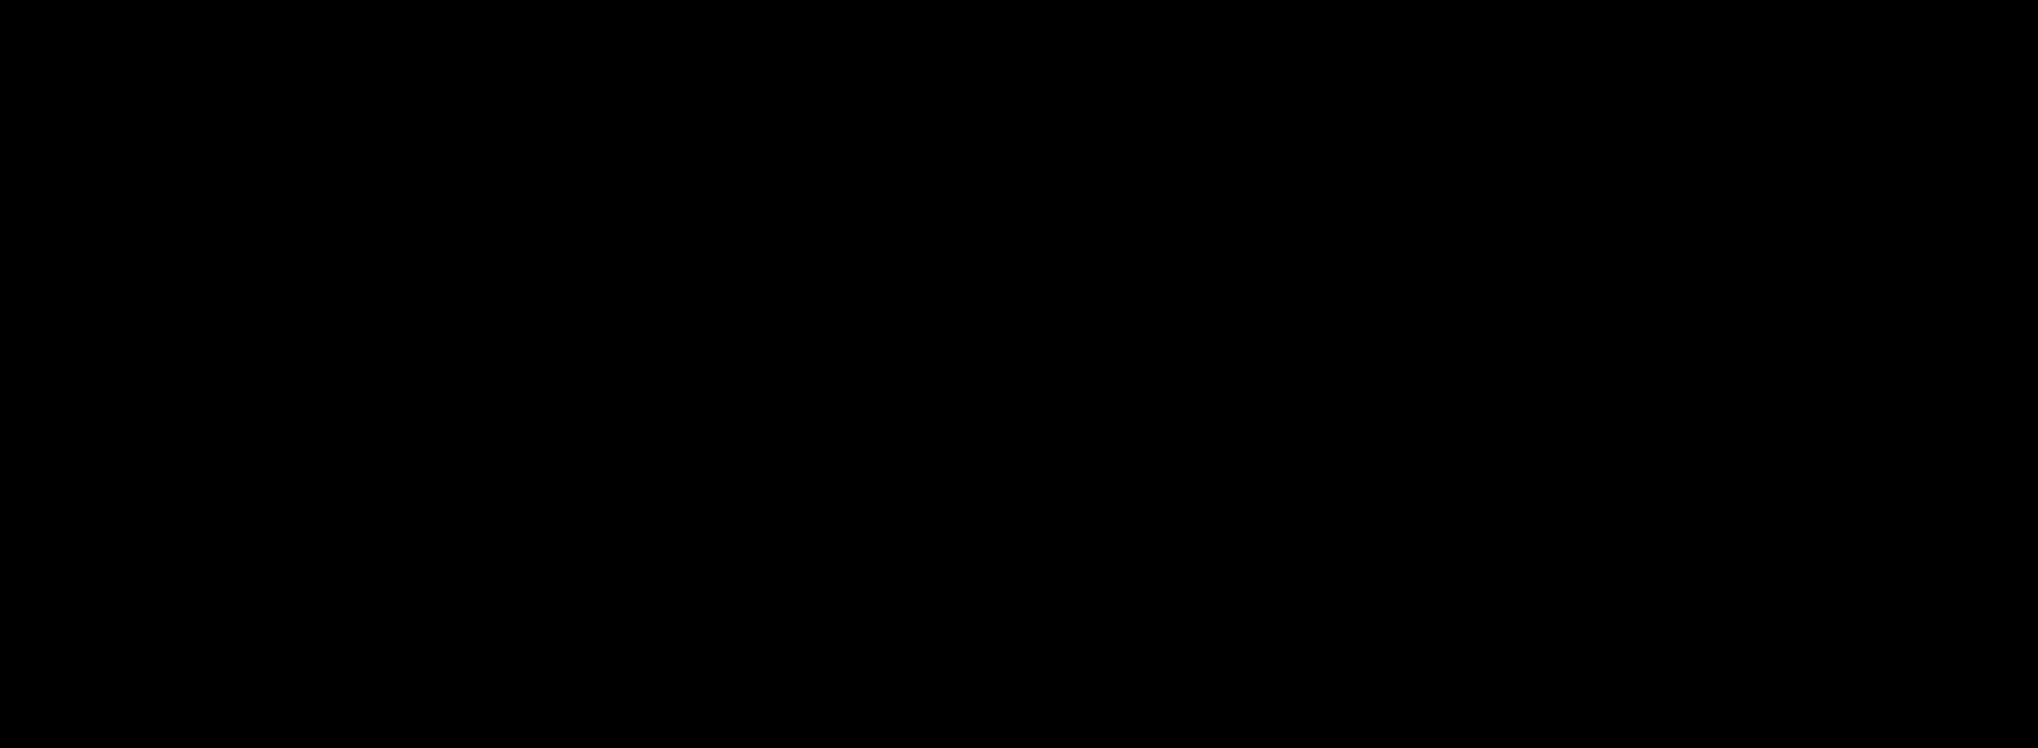 steinalderbrd-hovedbilde